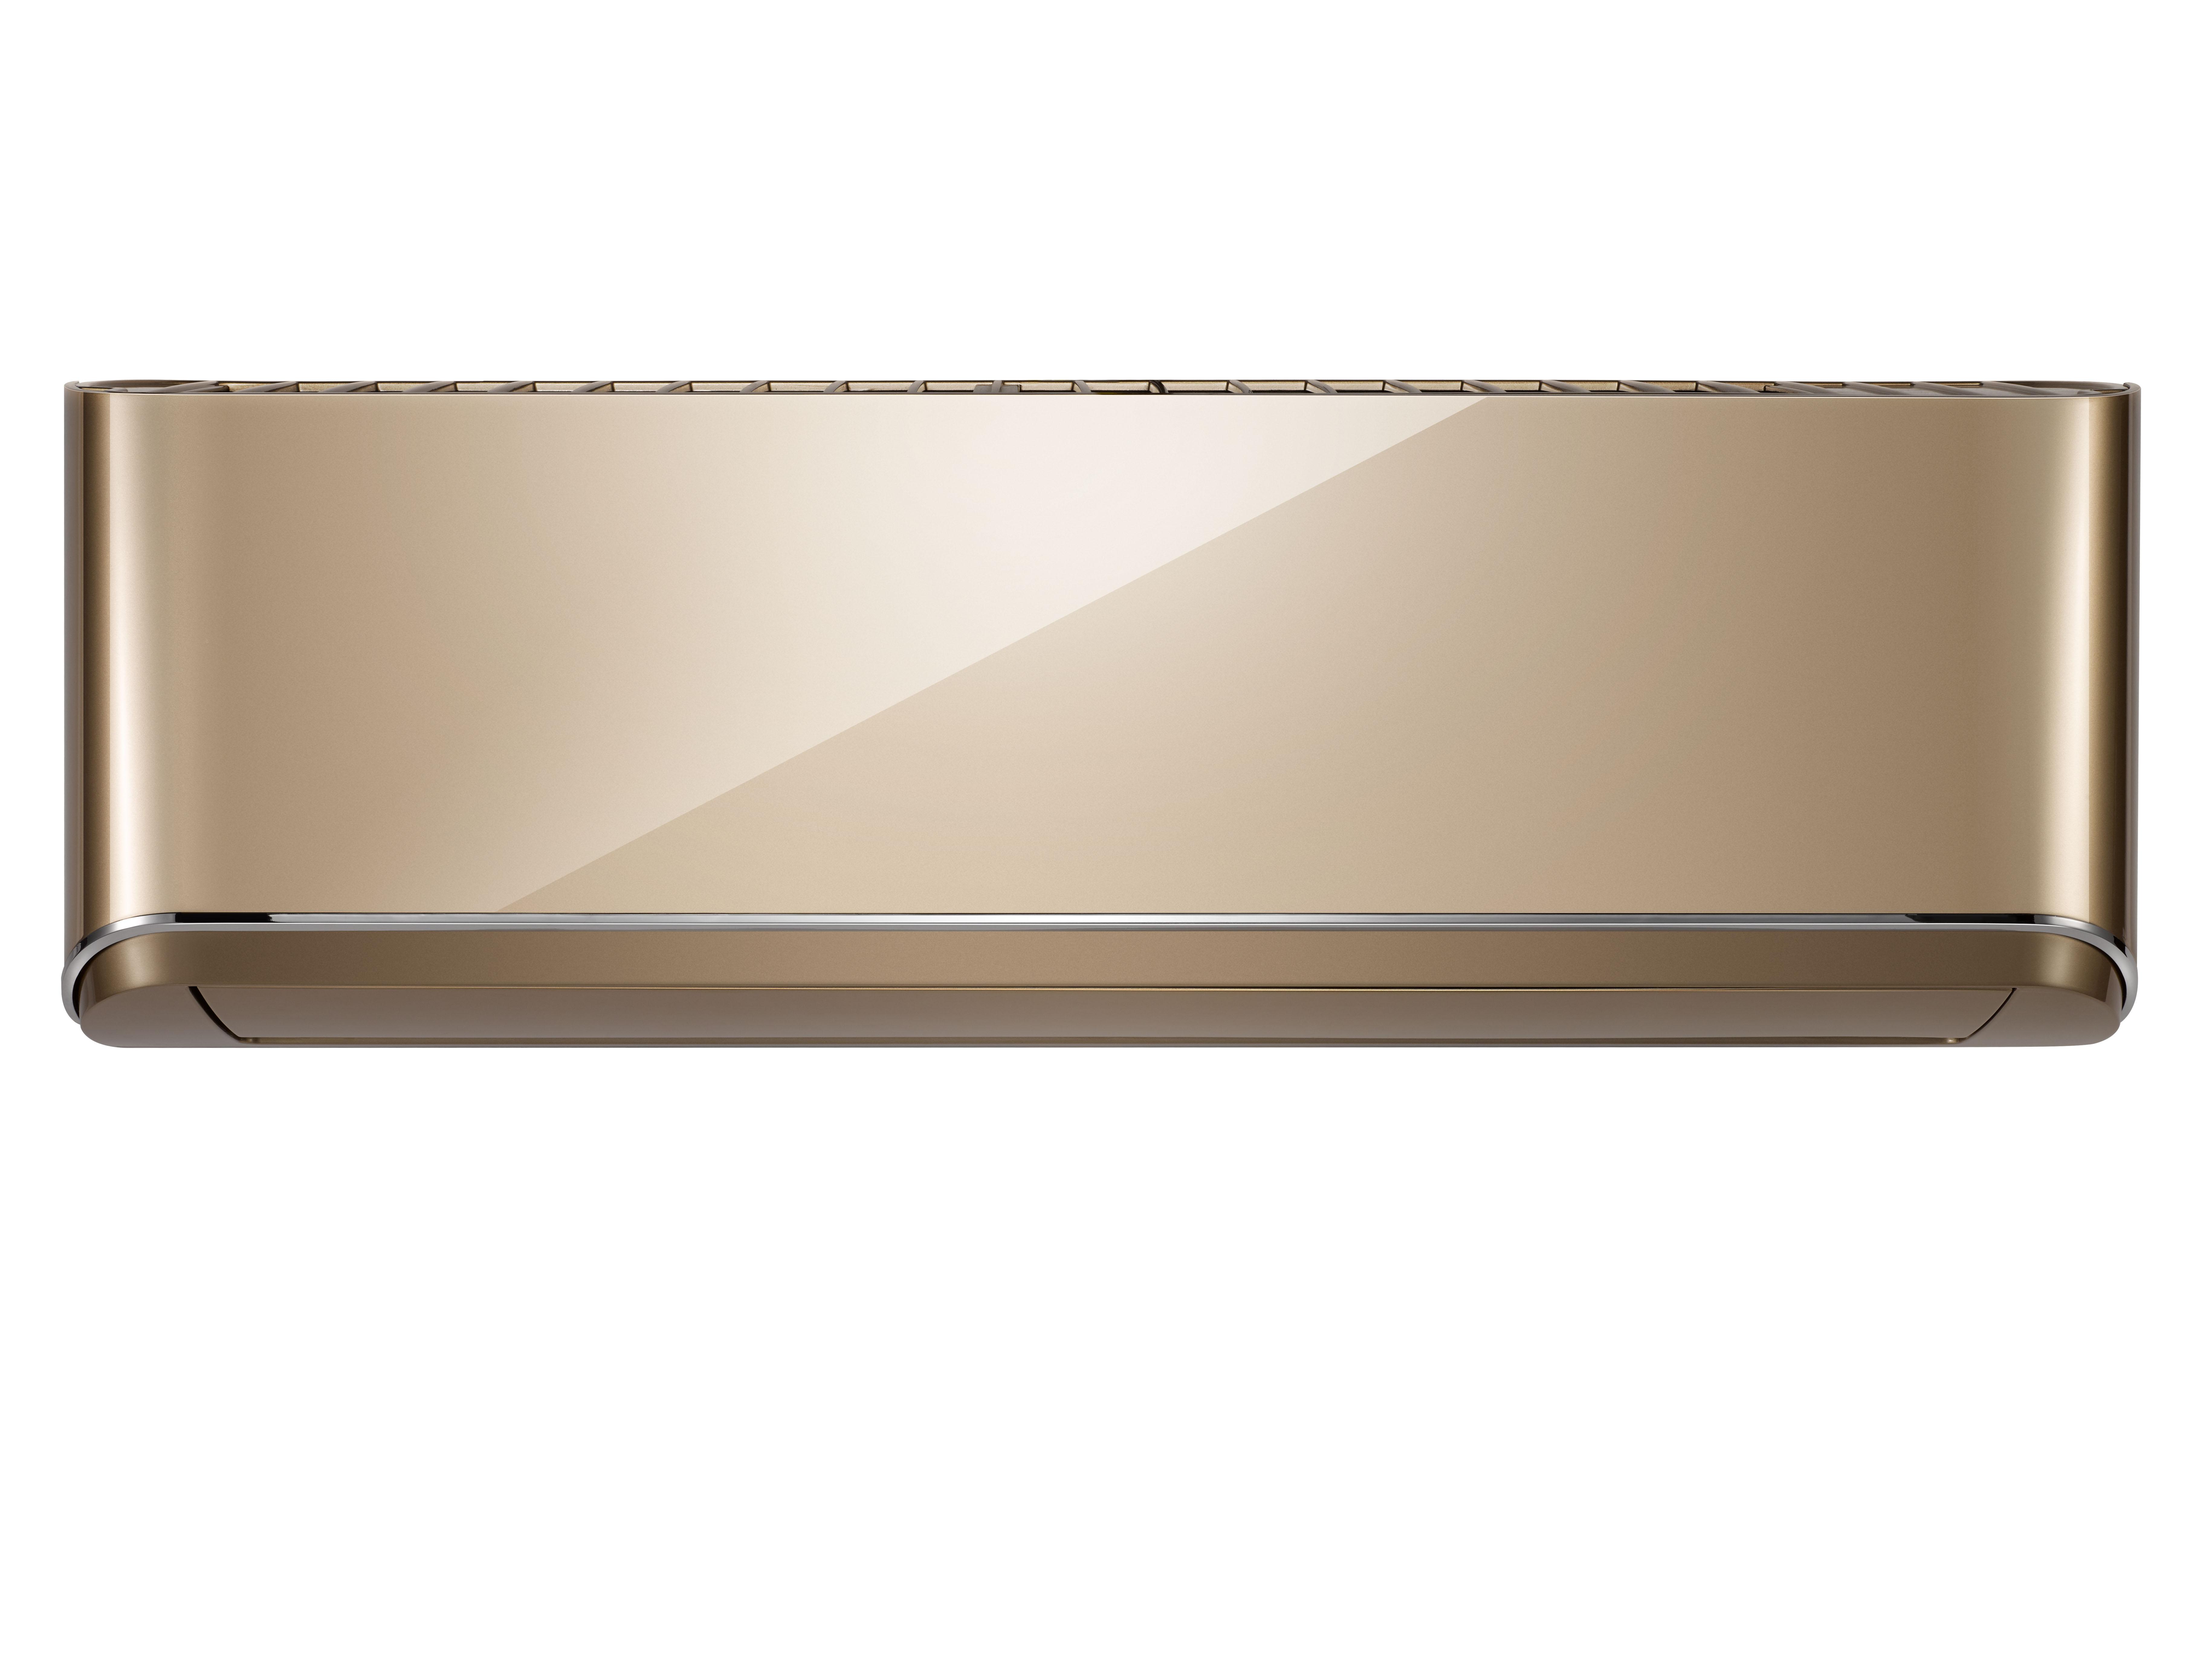 Midea/美的 KFR-35GW/BP3DN1Y-CE2(B2) 家用空调套机 说明书.pdf